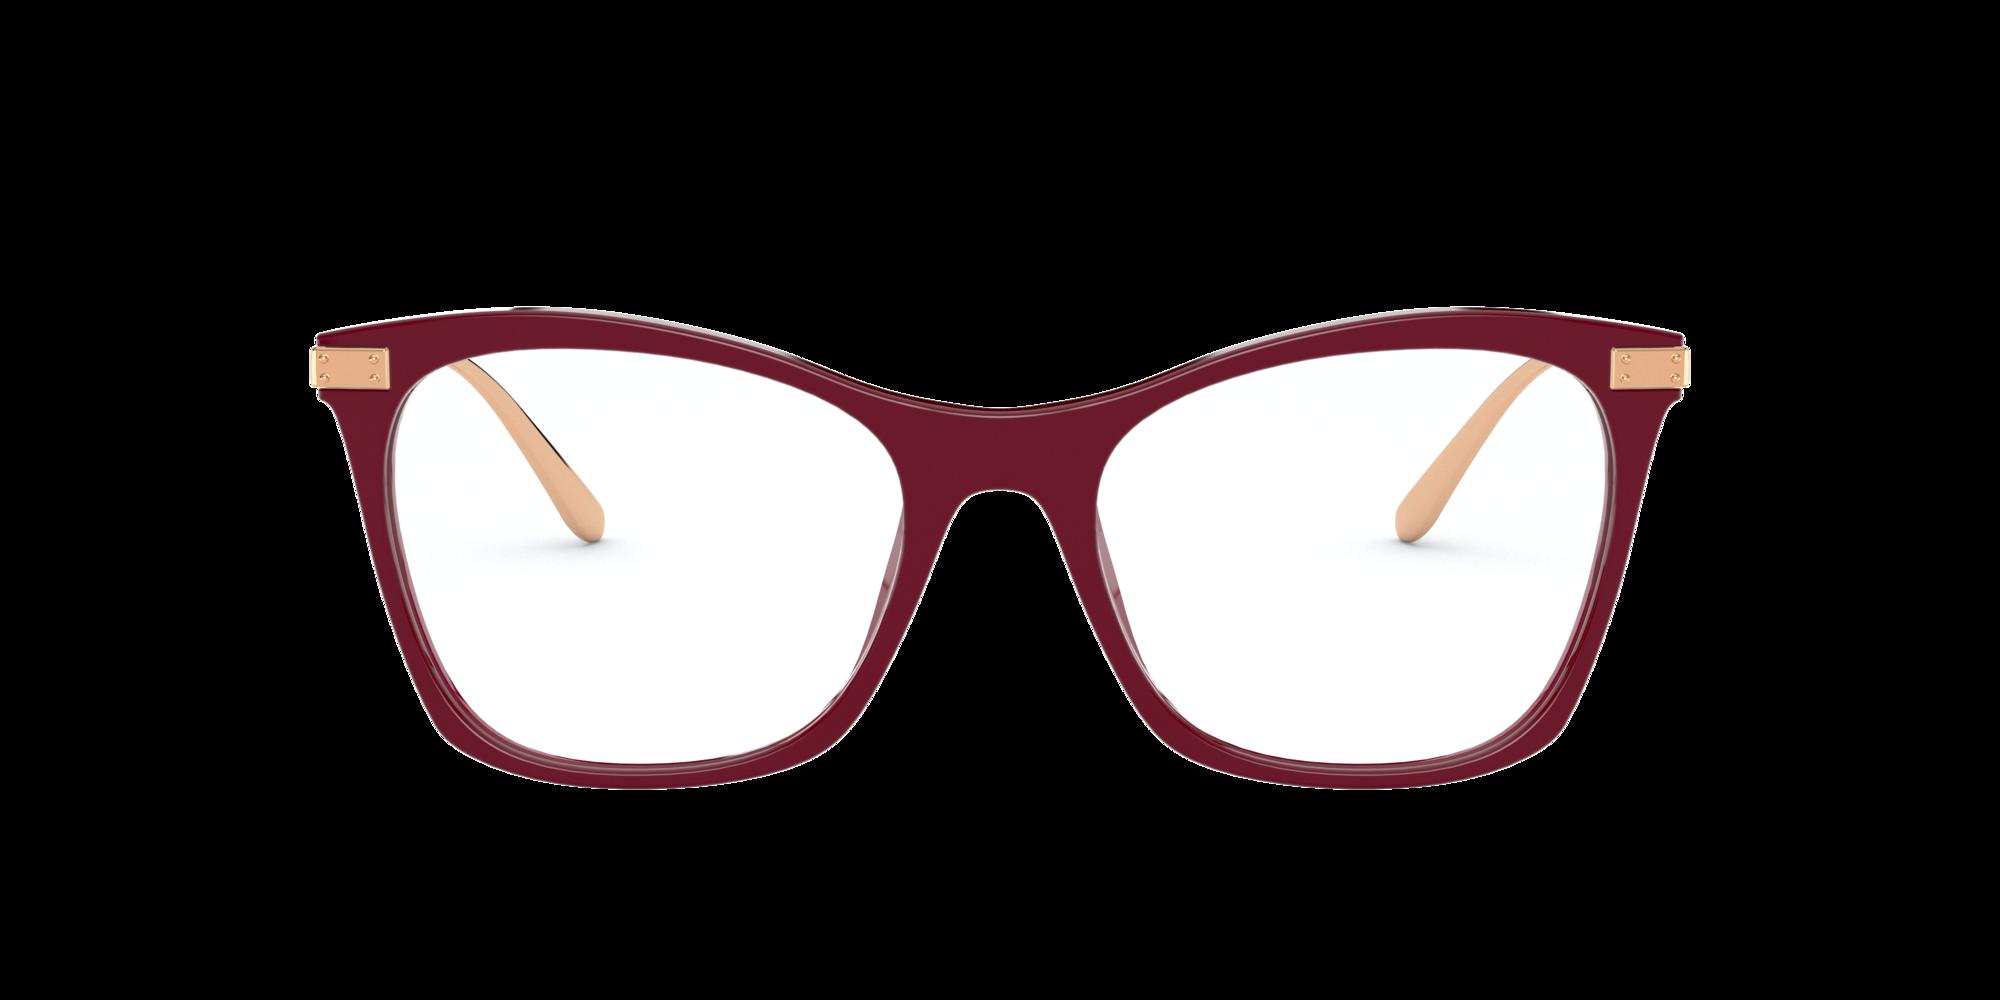 Image for DG3331 from LensCrafters | Glasses, Prescription Glasses Online, Eyewear